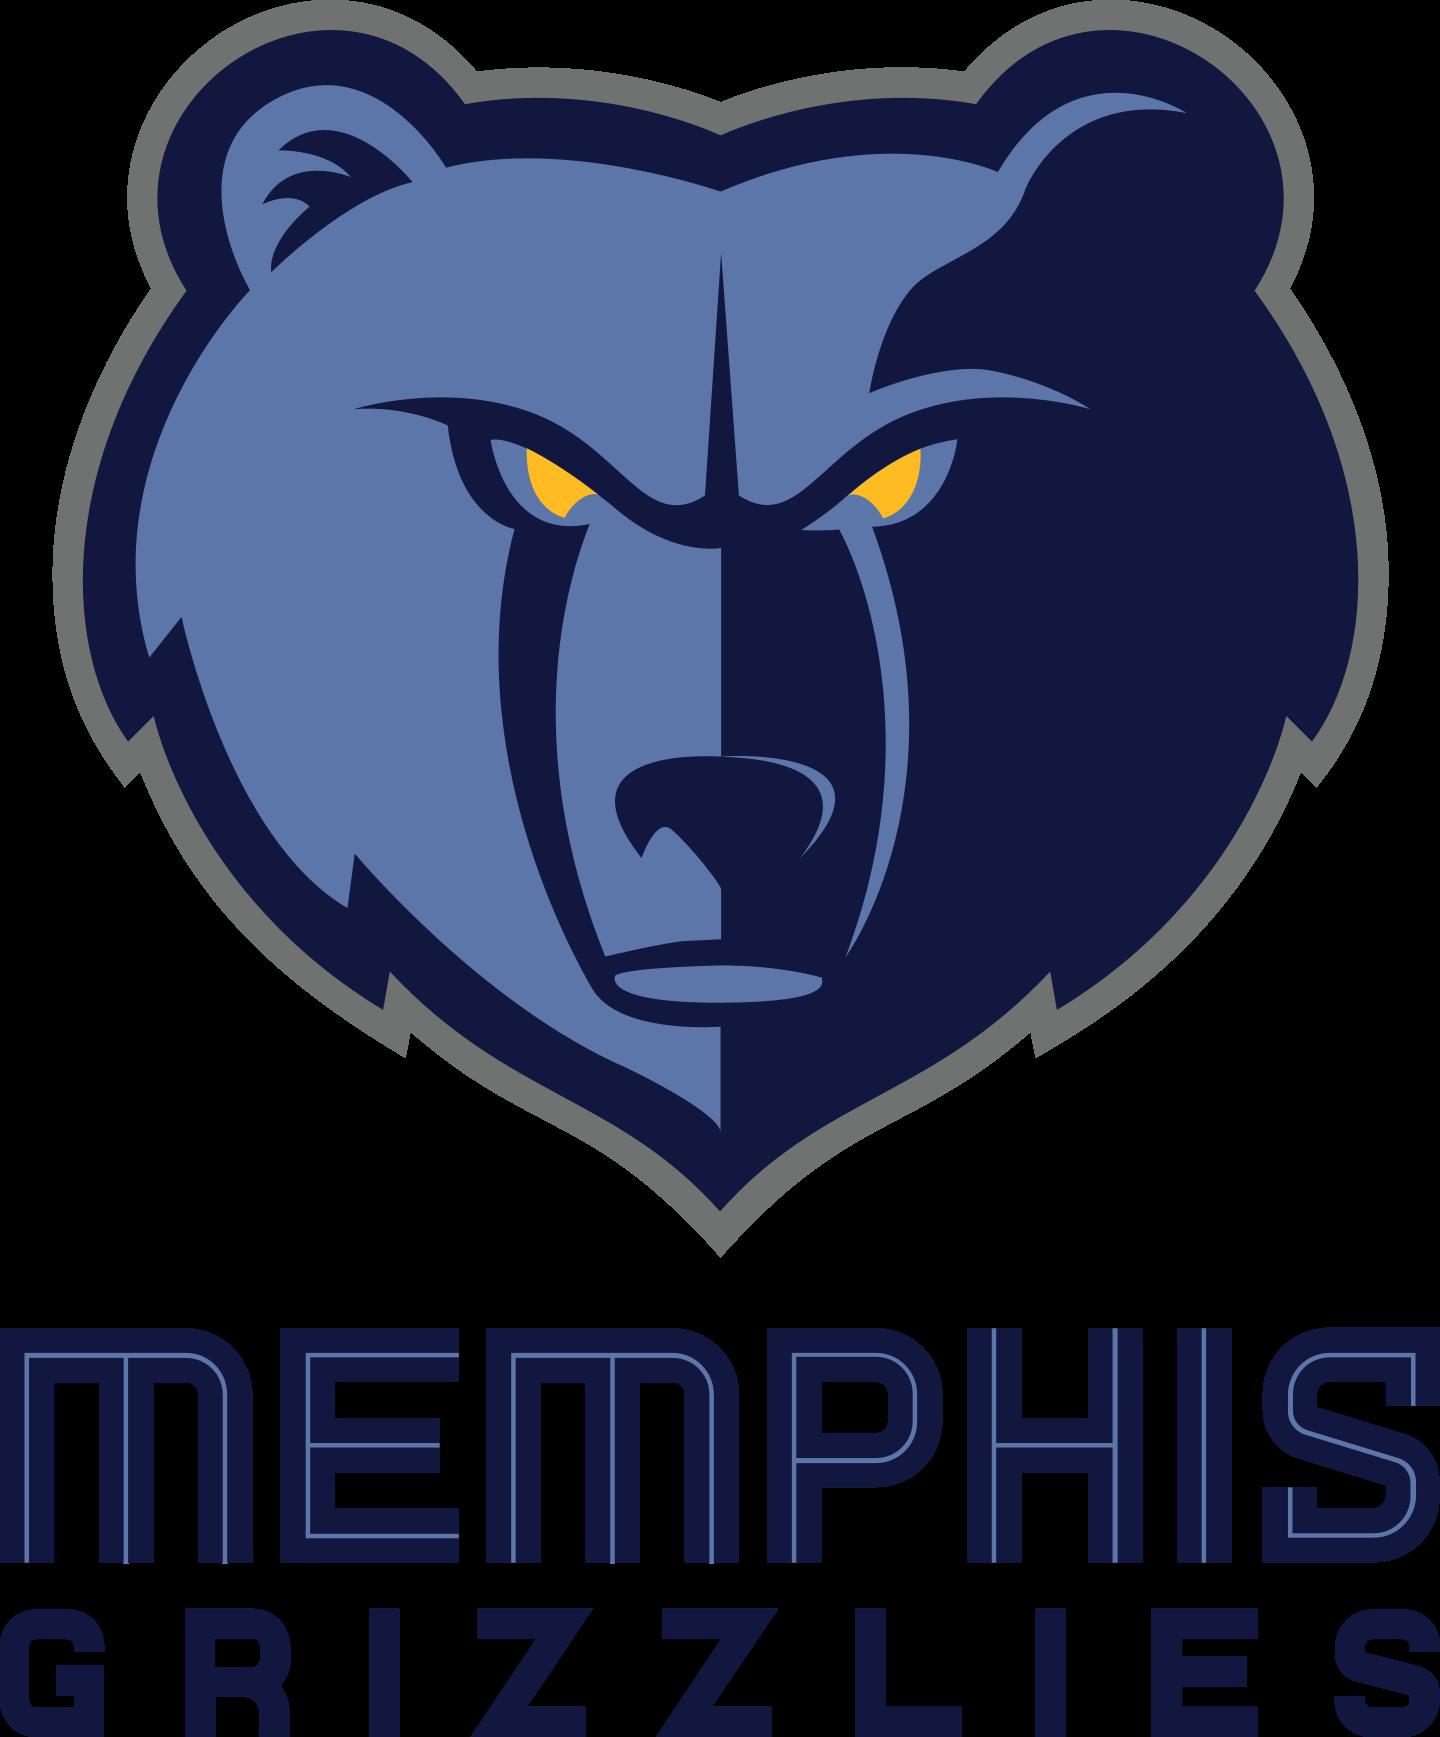 memphis grizzlies logo 3 - Memphis Grizzlies Logo